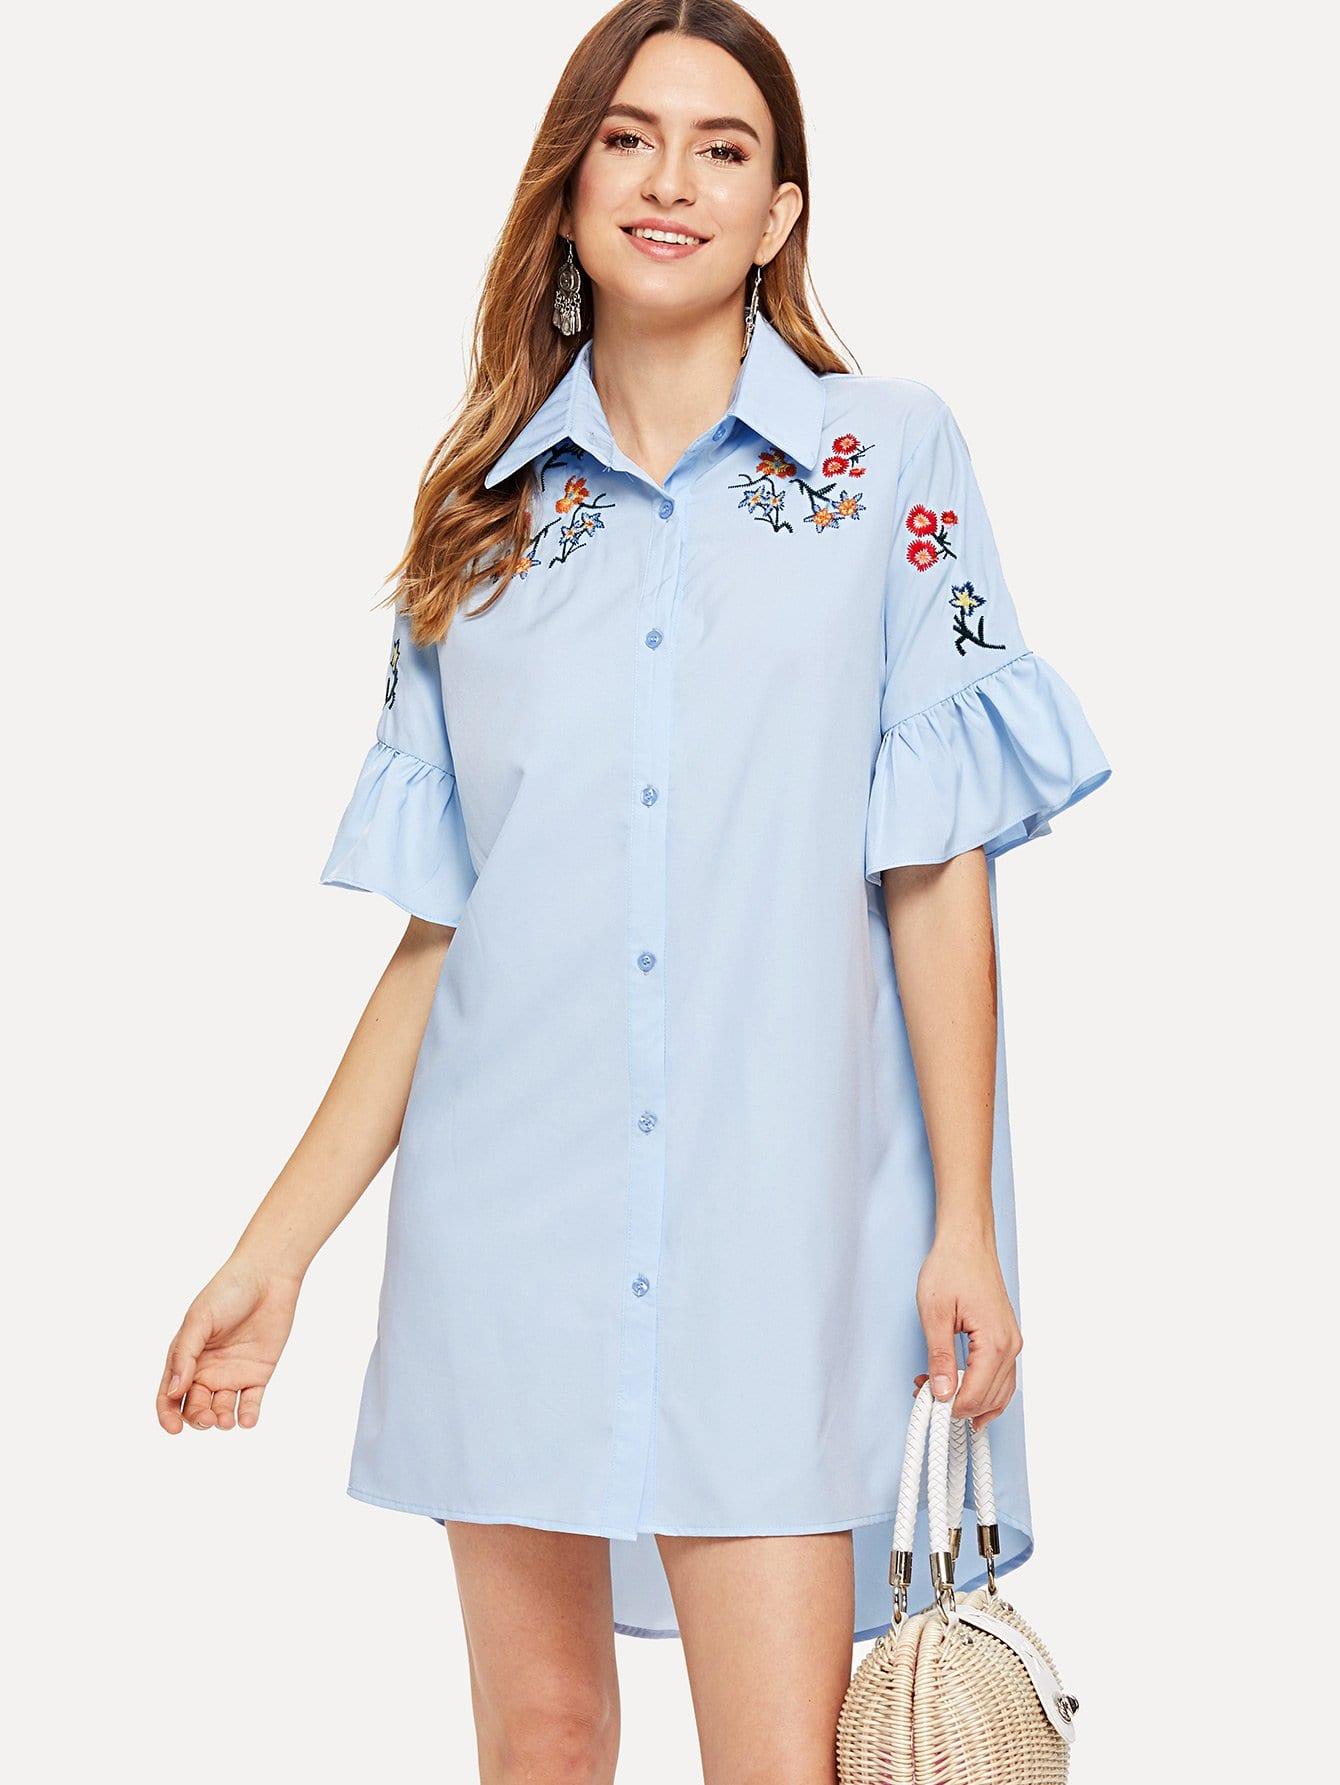 Ruffle Sleeve Embroidered Dip Hem Shirt Dress striped sleeve ruffle dip hem dress